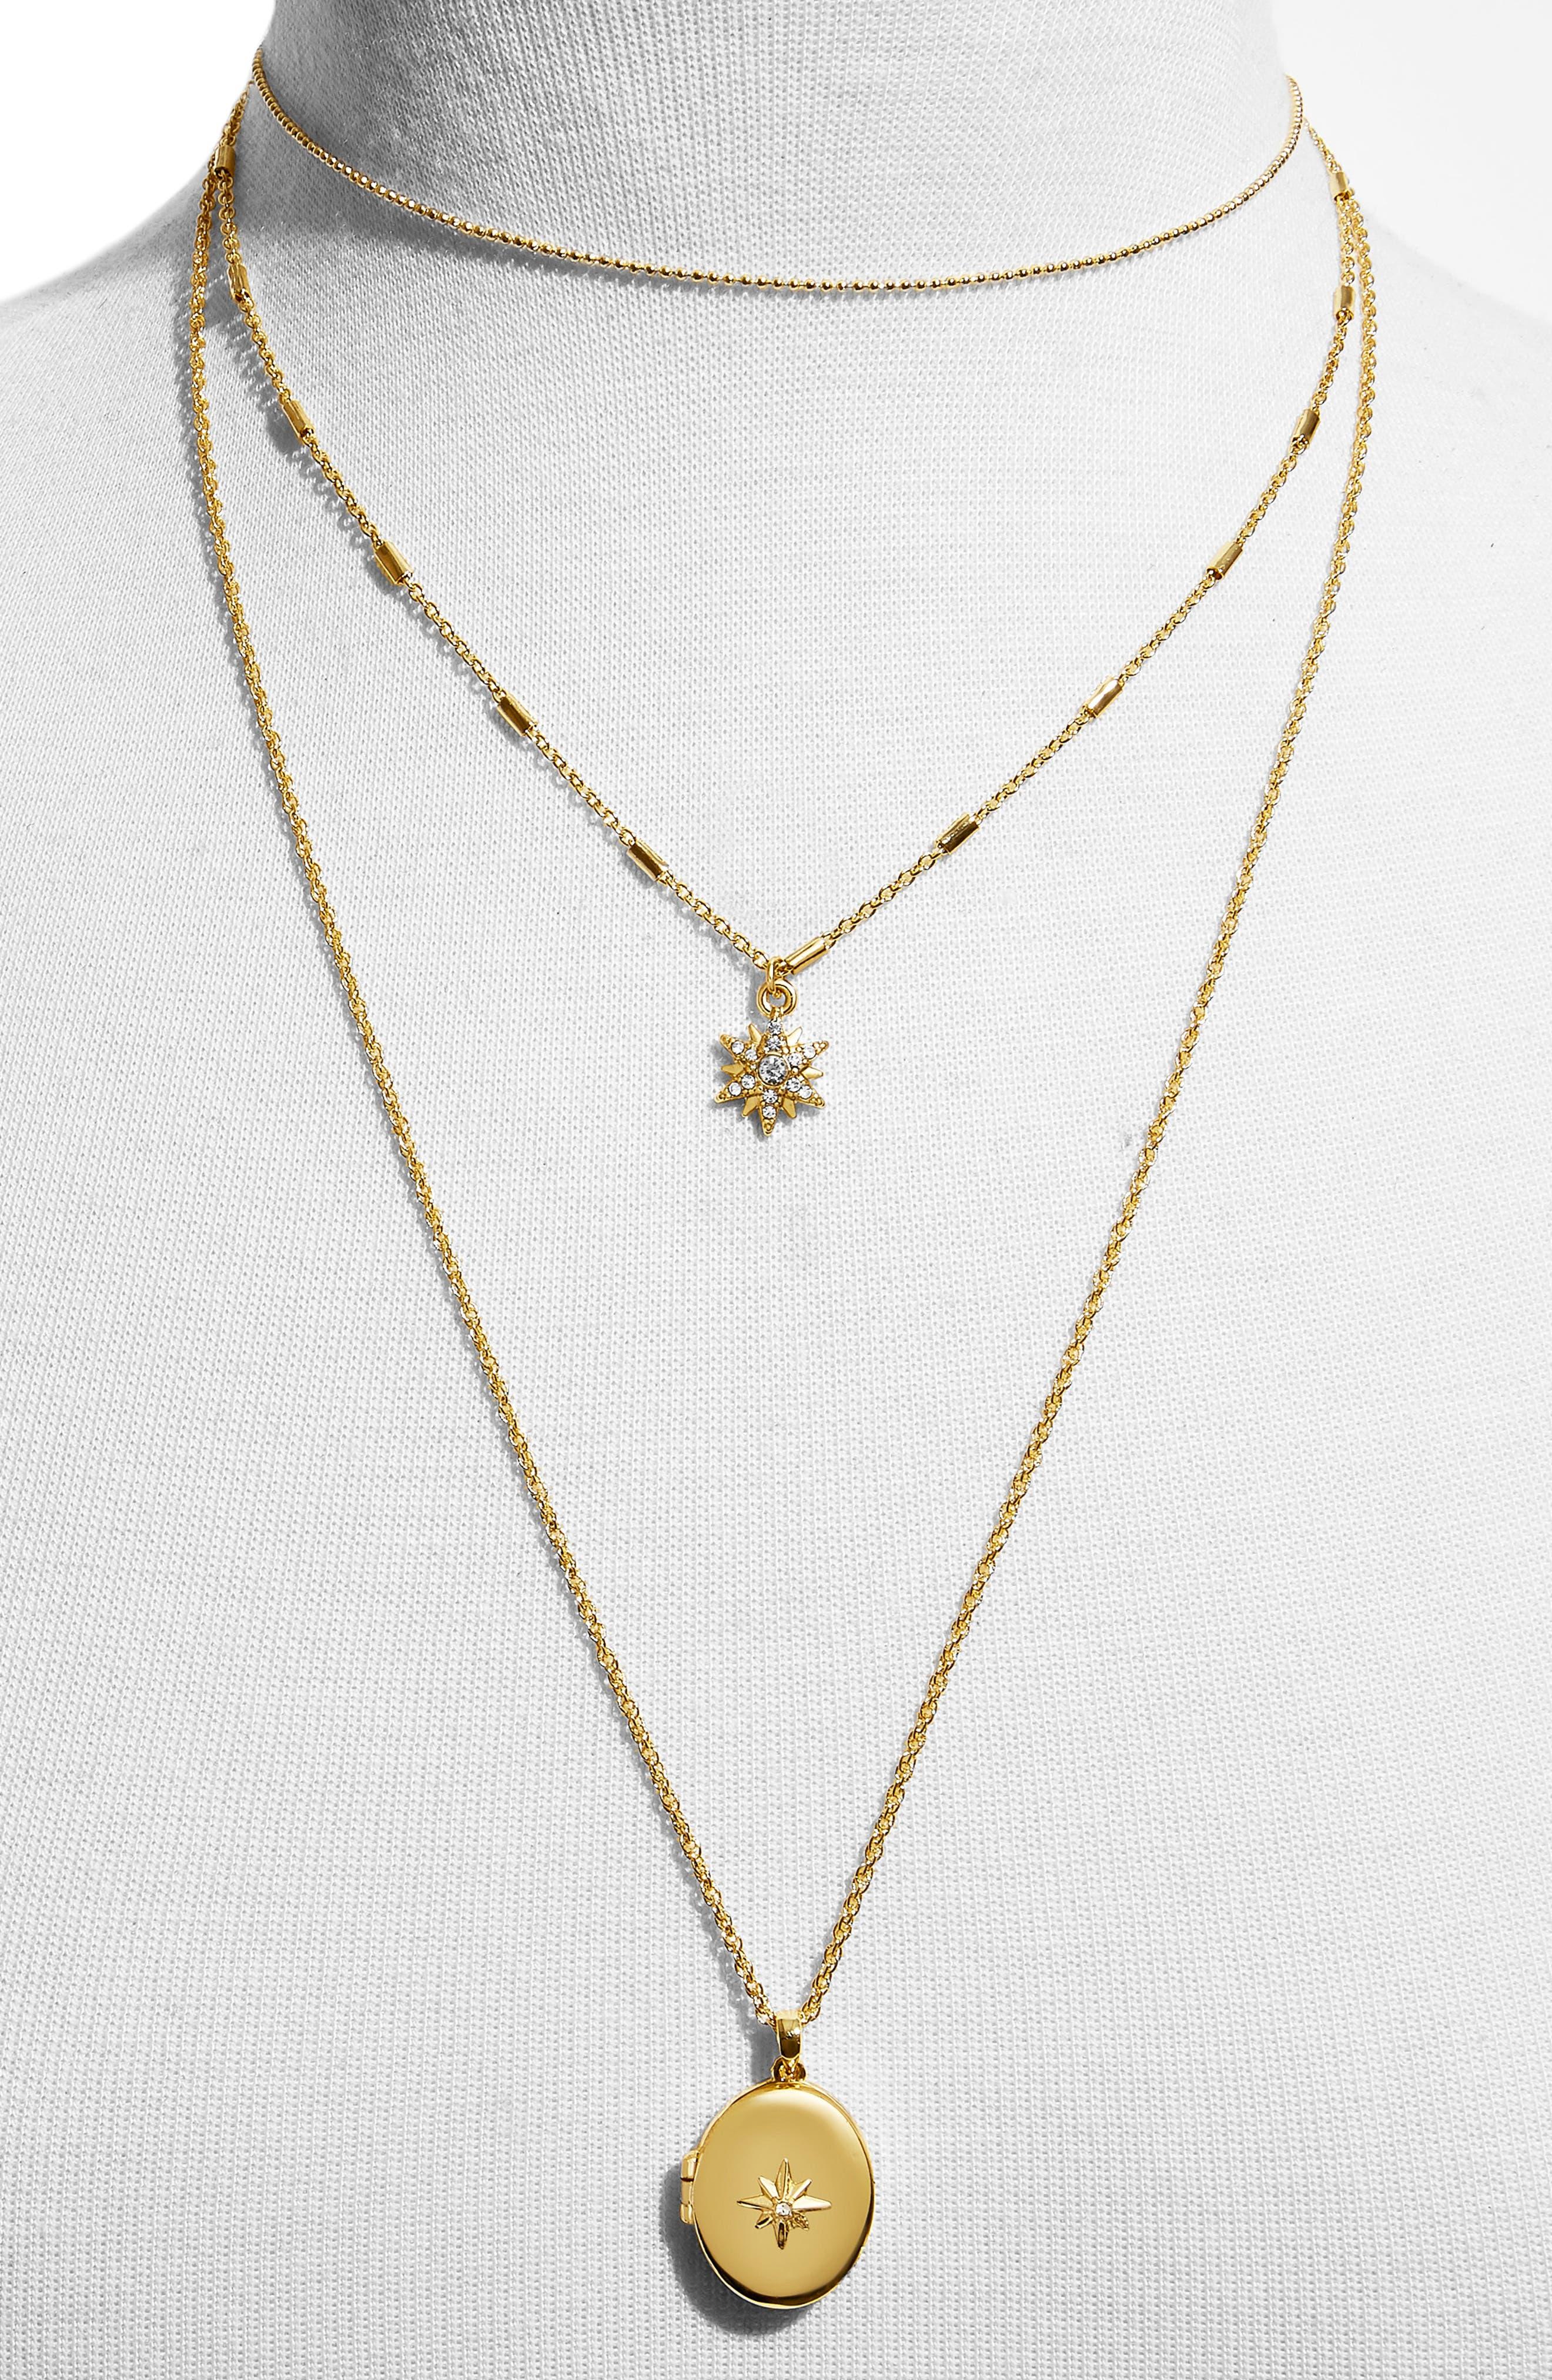 BAUBLEBAR, Melisandra Layered Pendant Necklace, Alternate thumbnail 2, color, GOLD